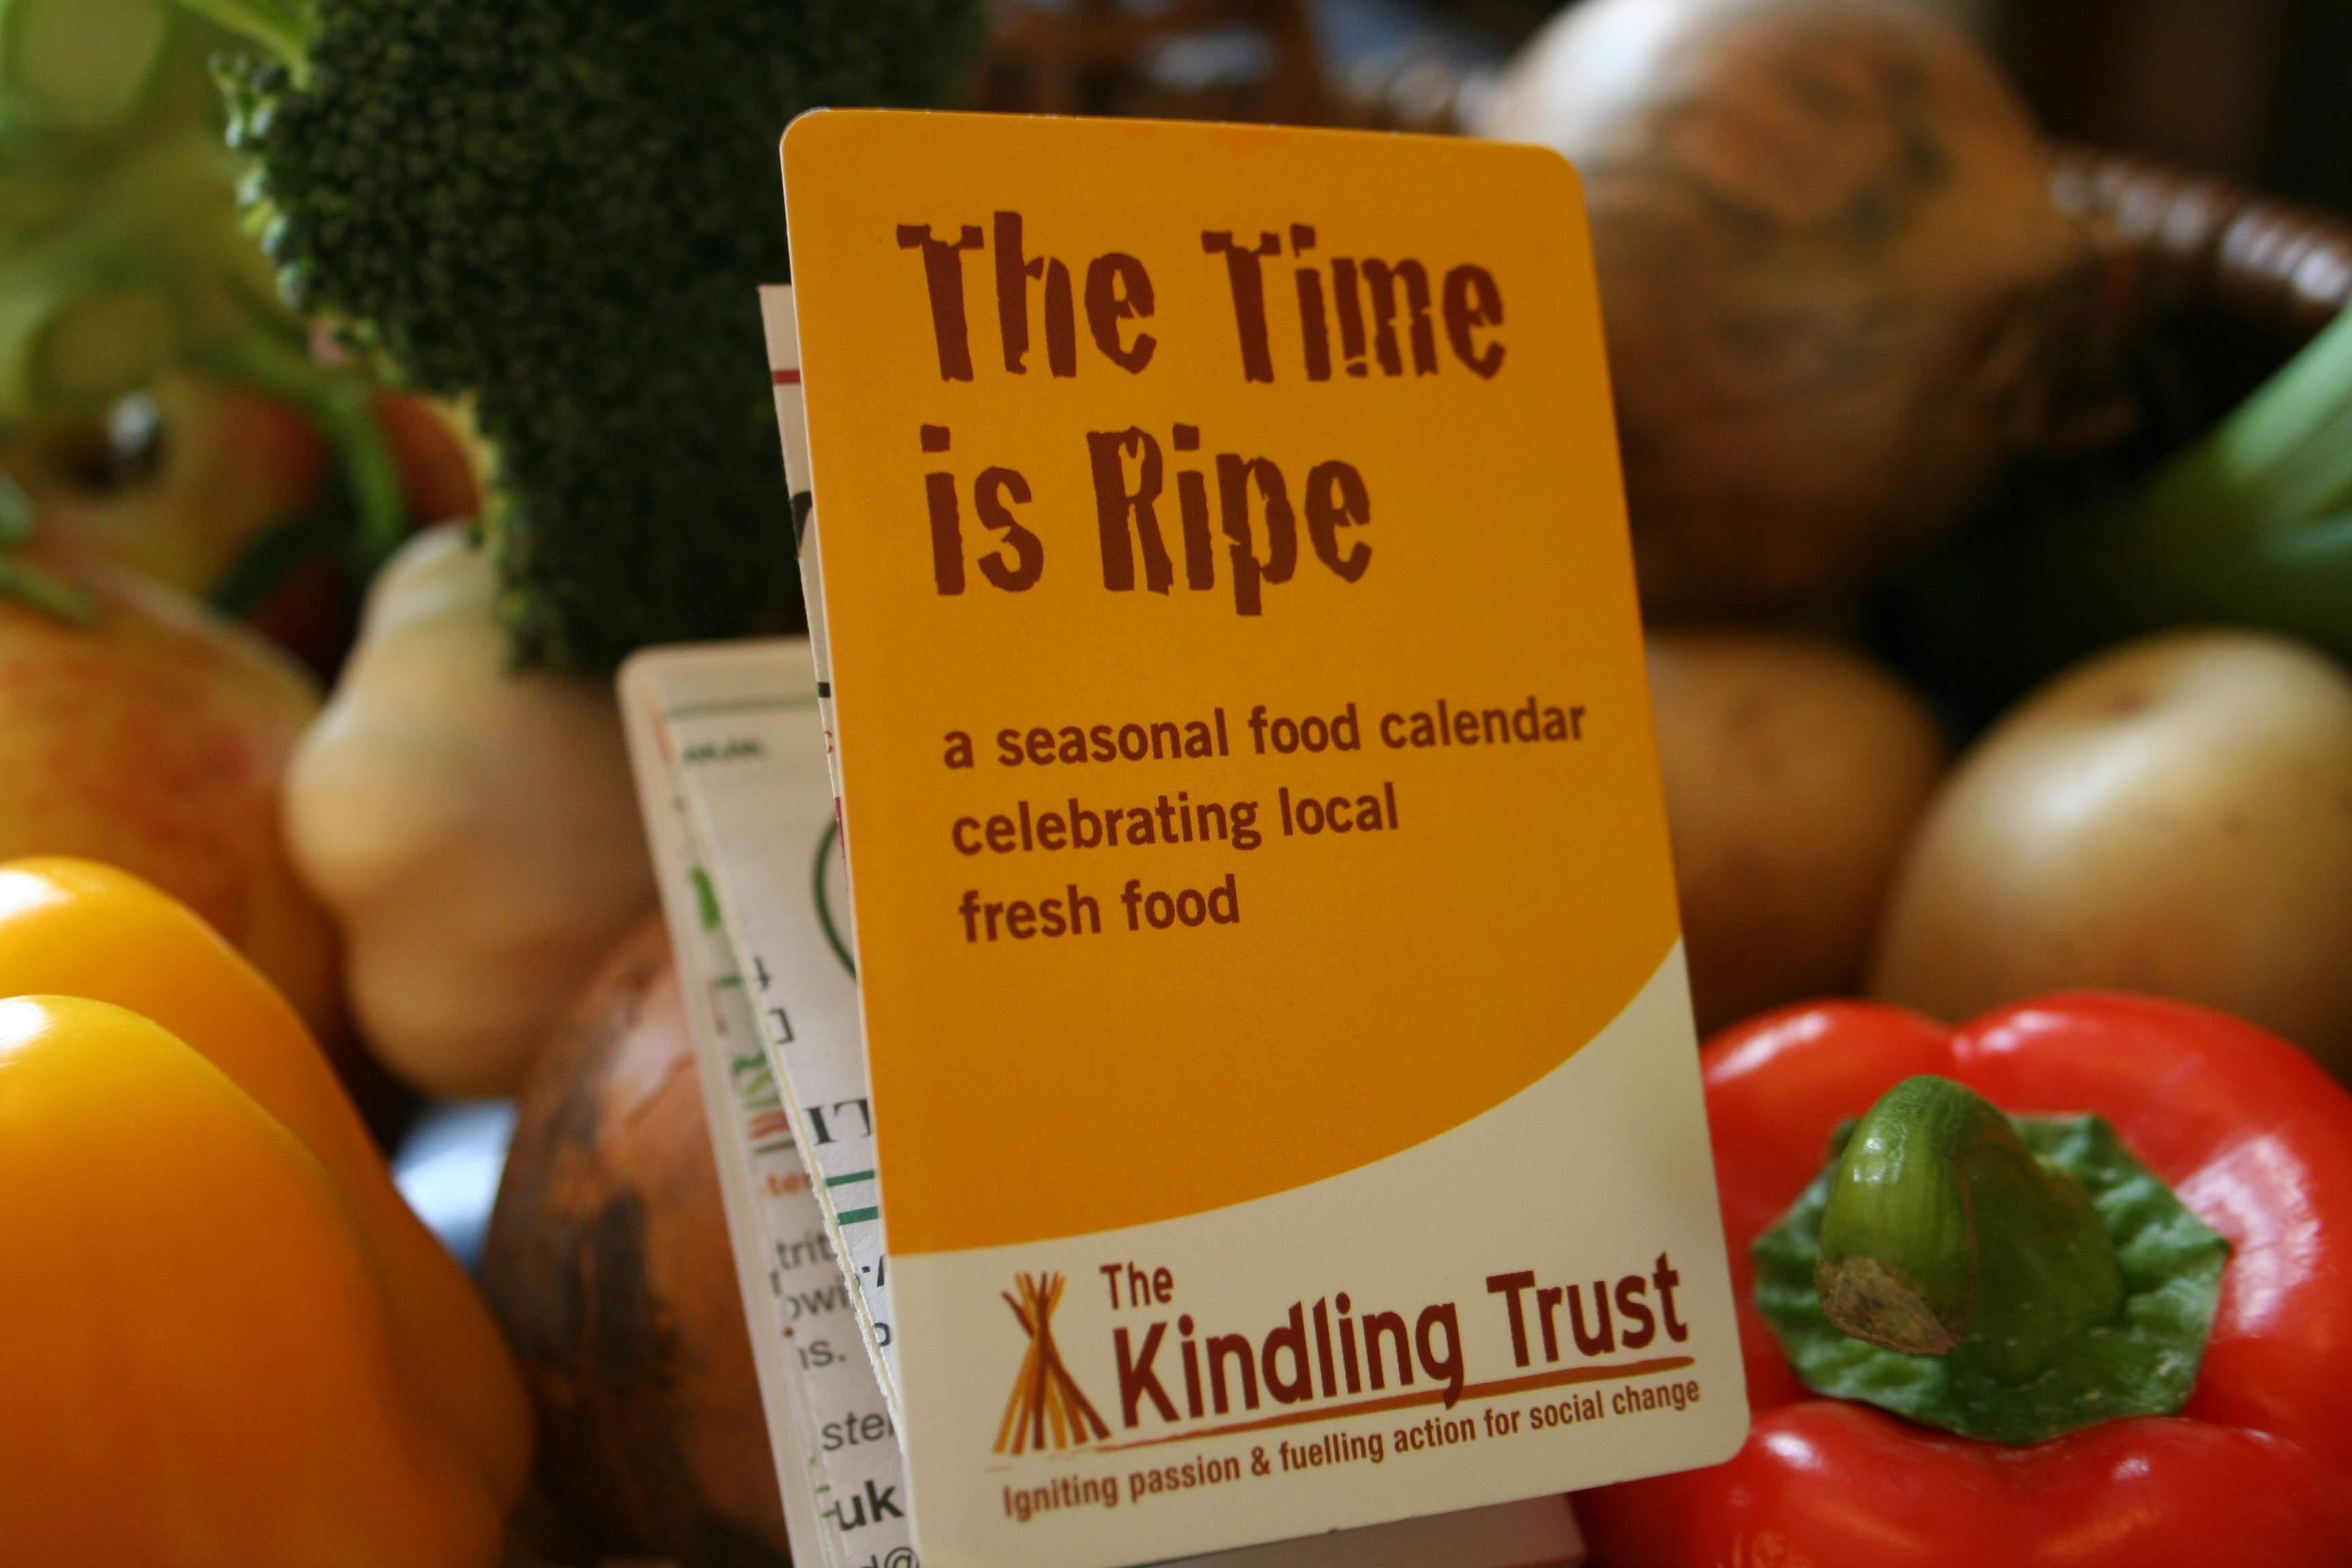 The Time is Ripe seasonal food calendar.